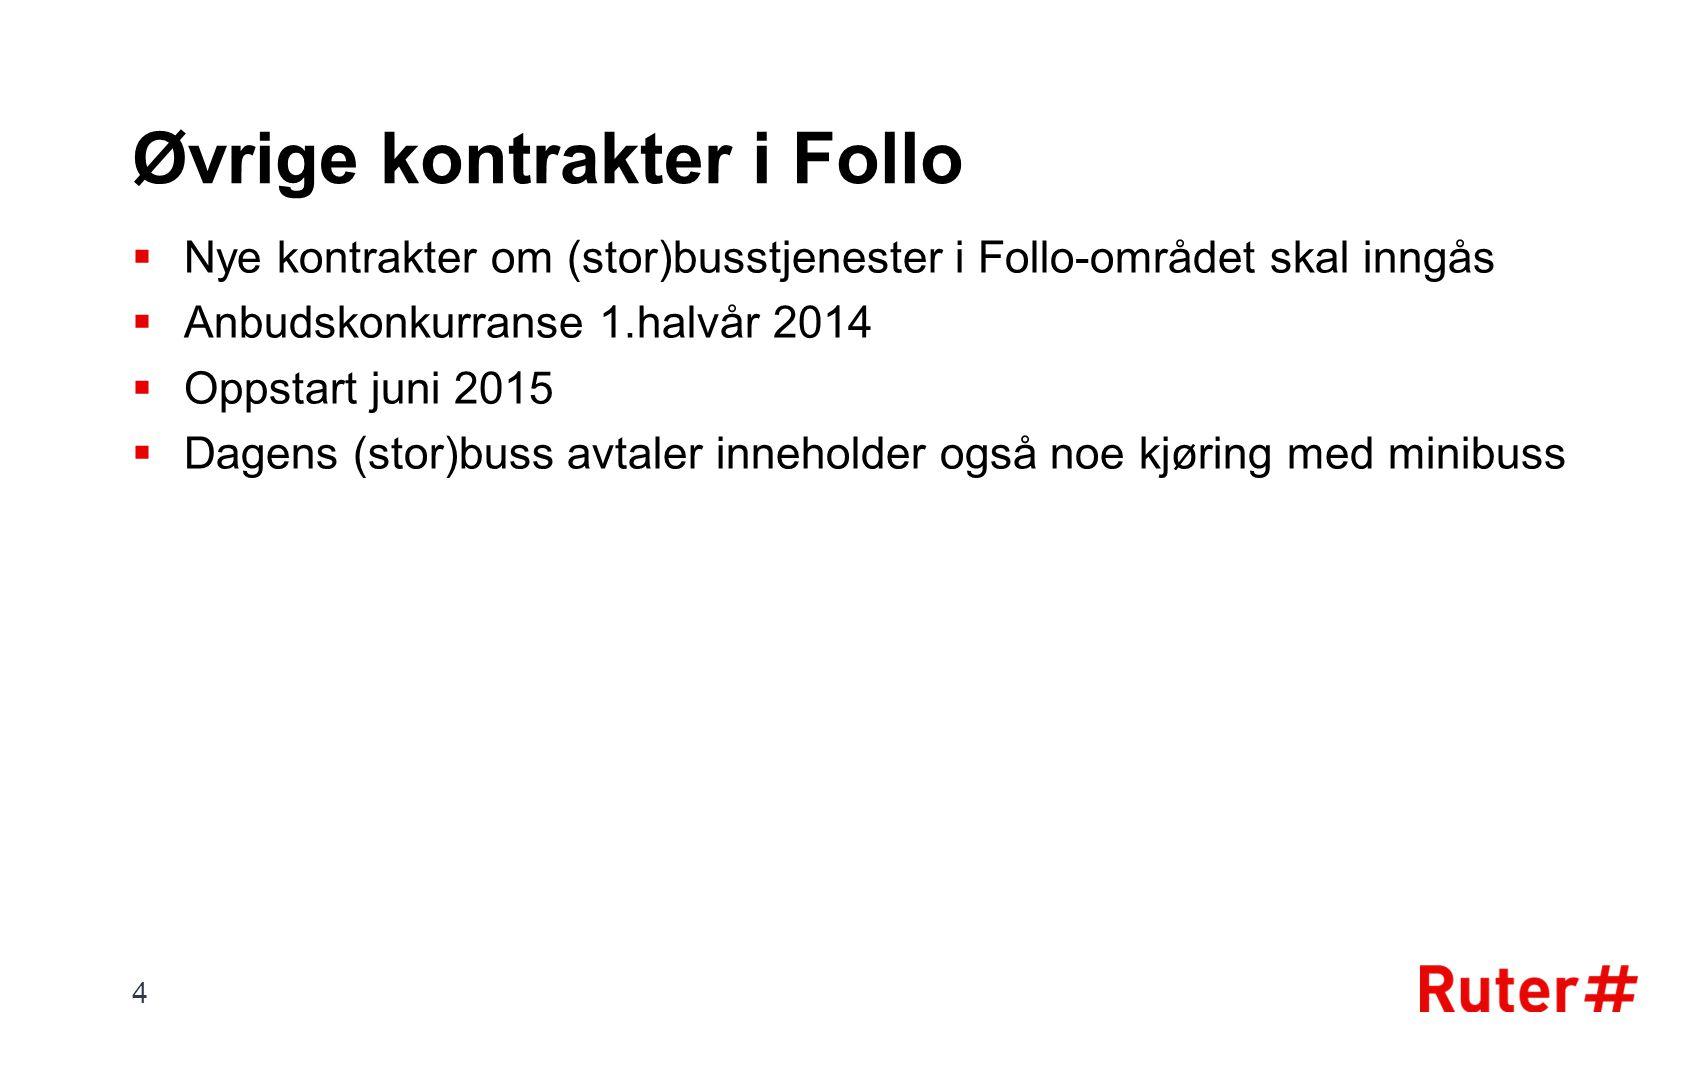 Øvrige kontrakter i Follo